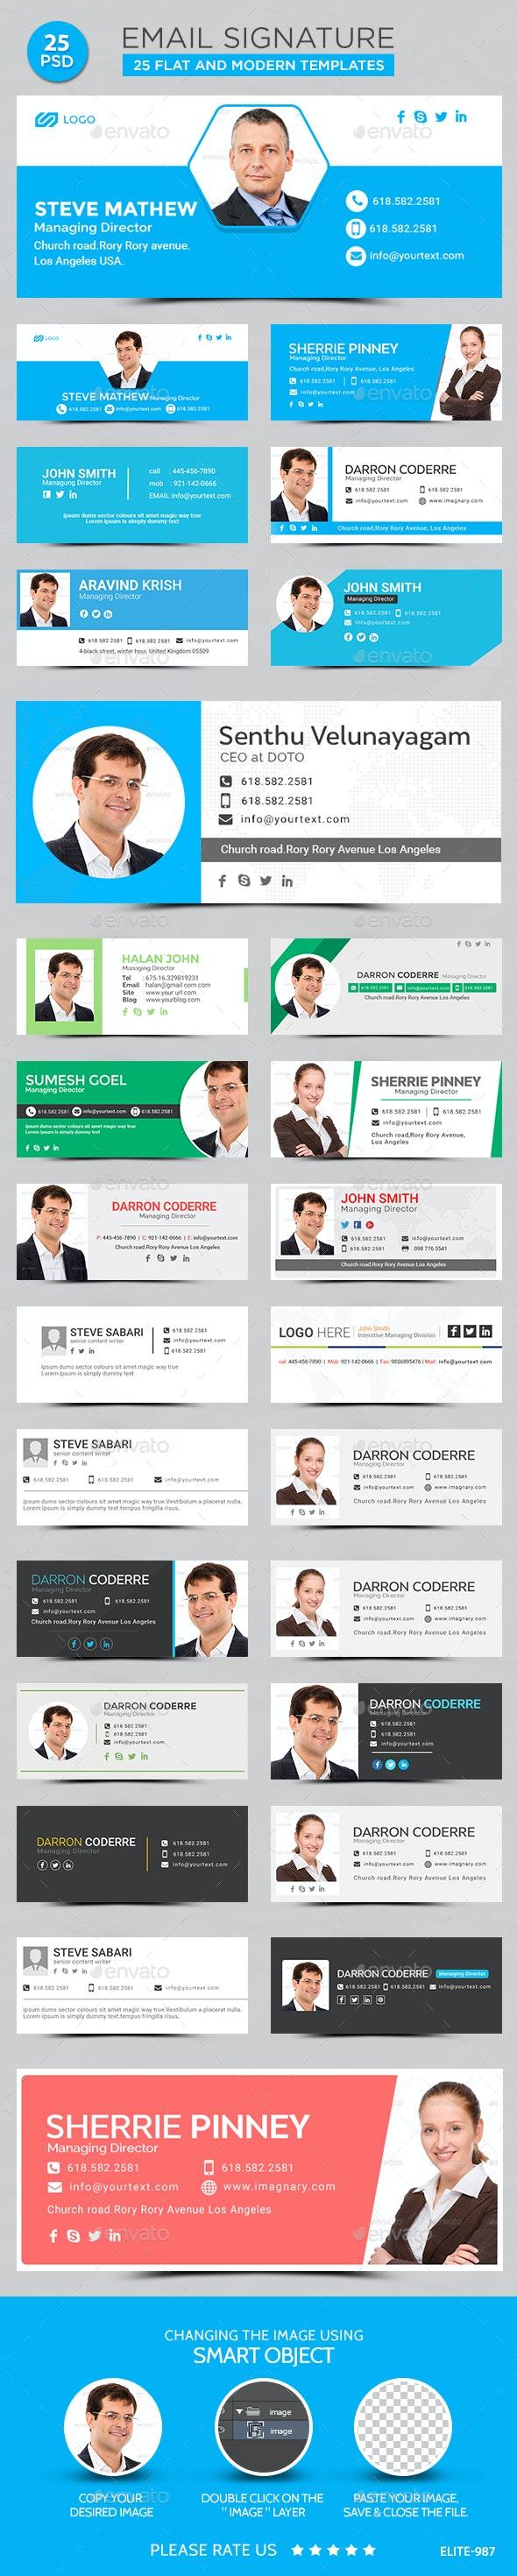 Email Signatures Templates - 25 Designs - Miscellaneous Web Elements